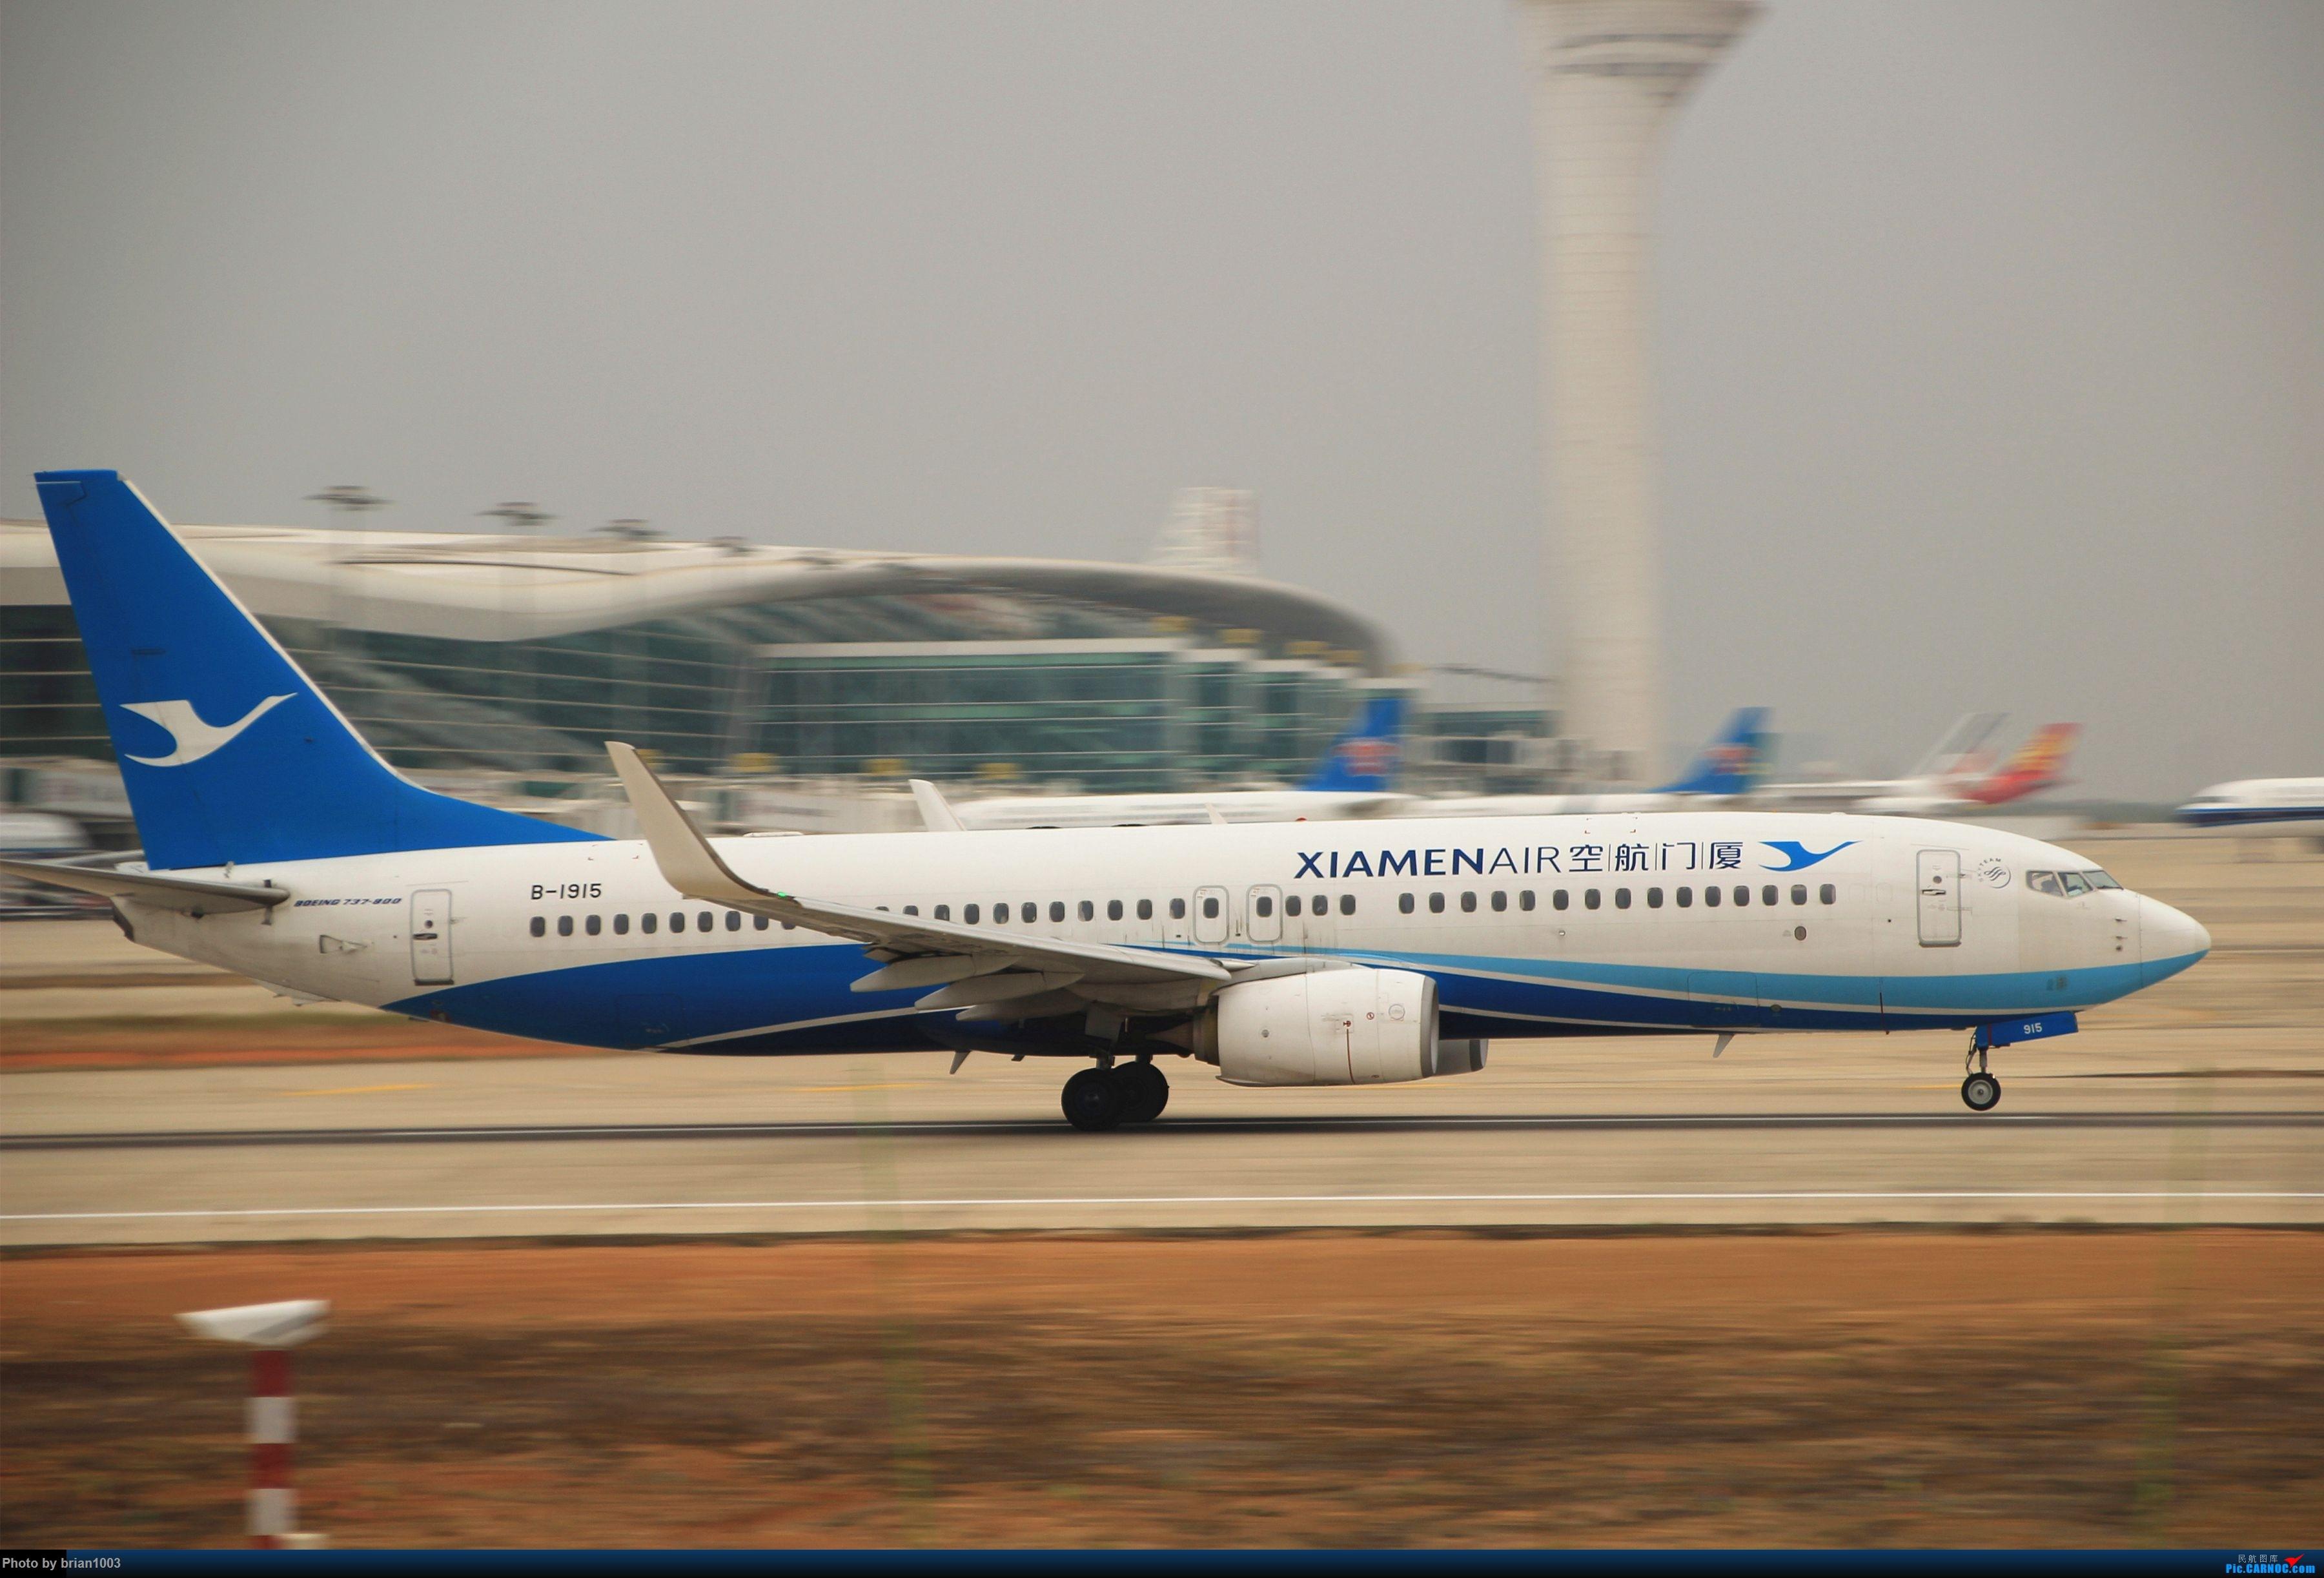 Re:[原创]WUH武汉天河机场拍机之新航季来的海航333和幸福的738 BOEING 737-800 B-1915 中国武汉天河国际机场